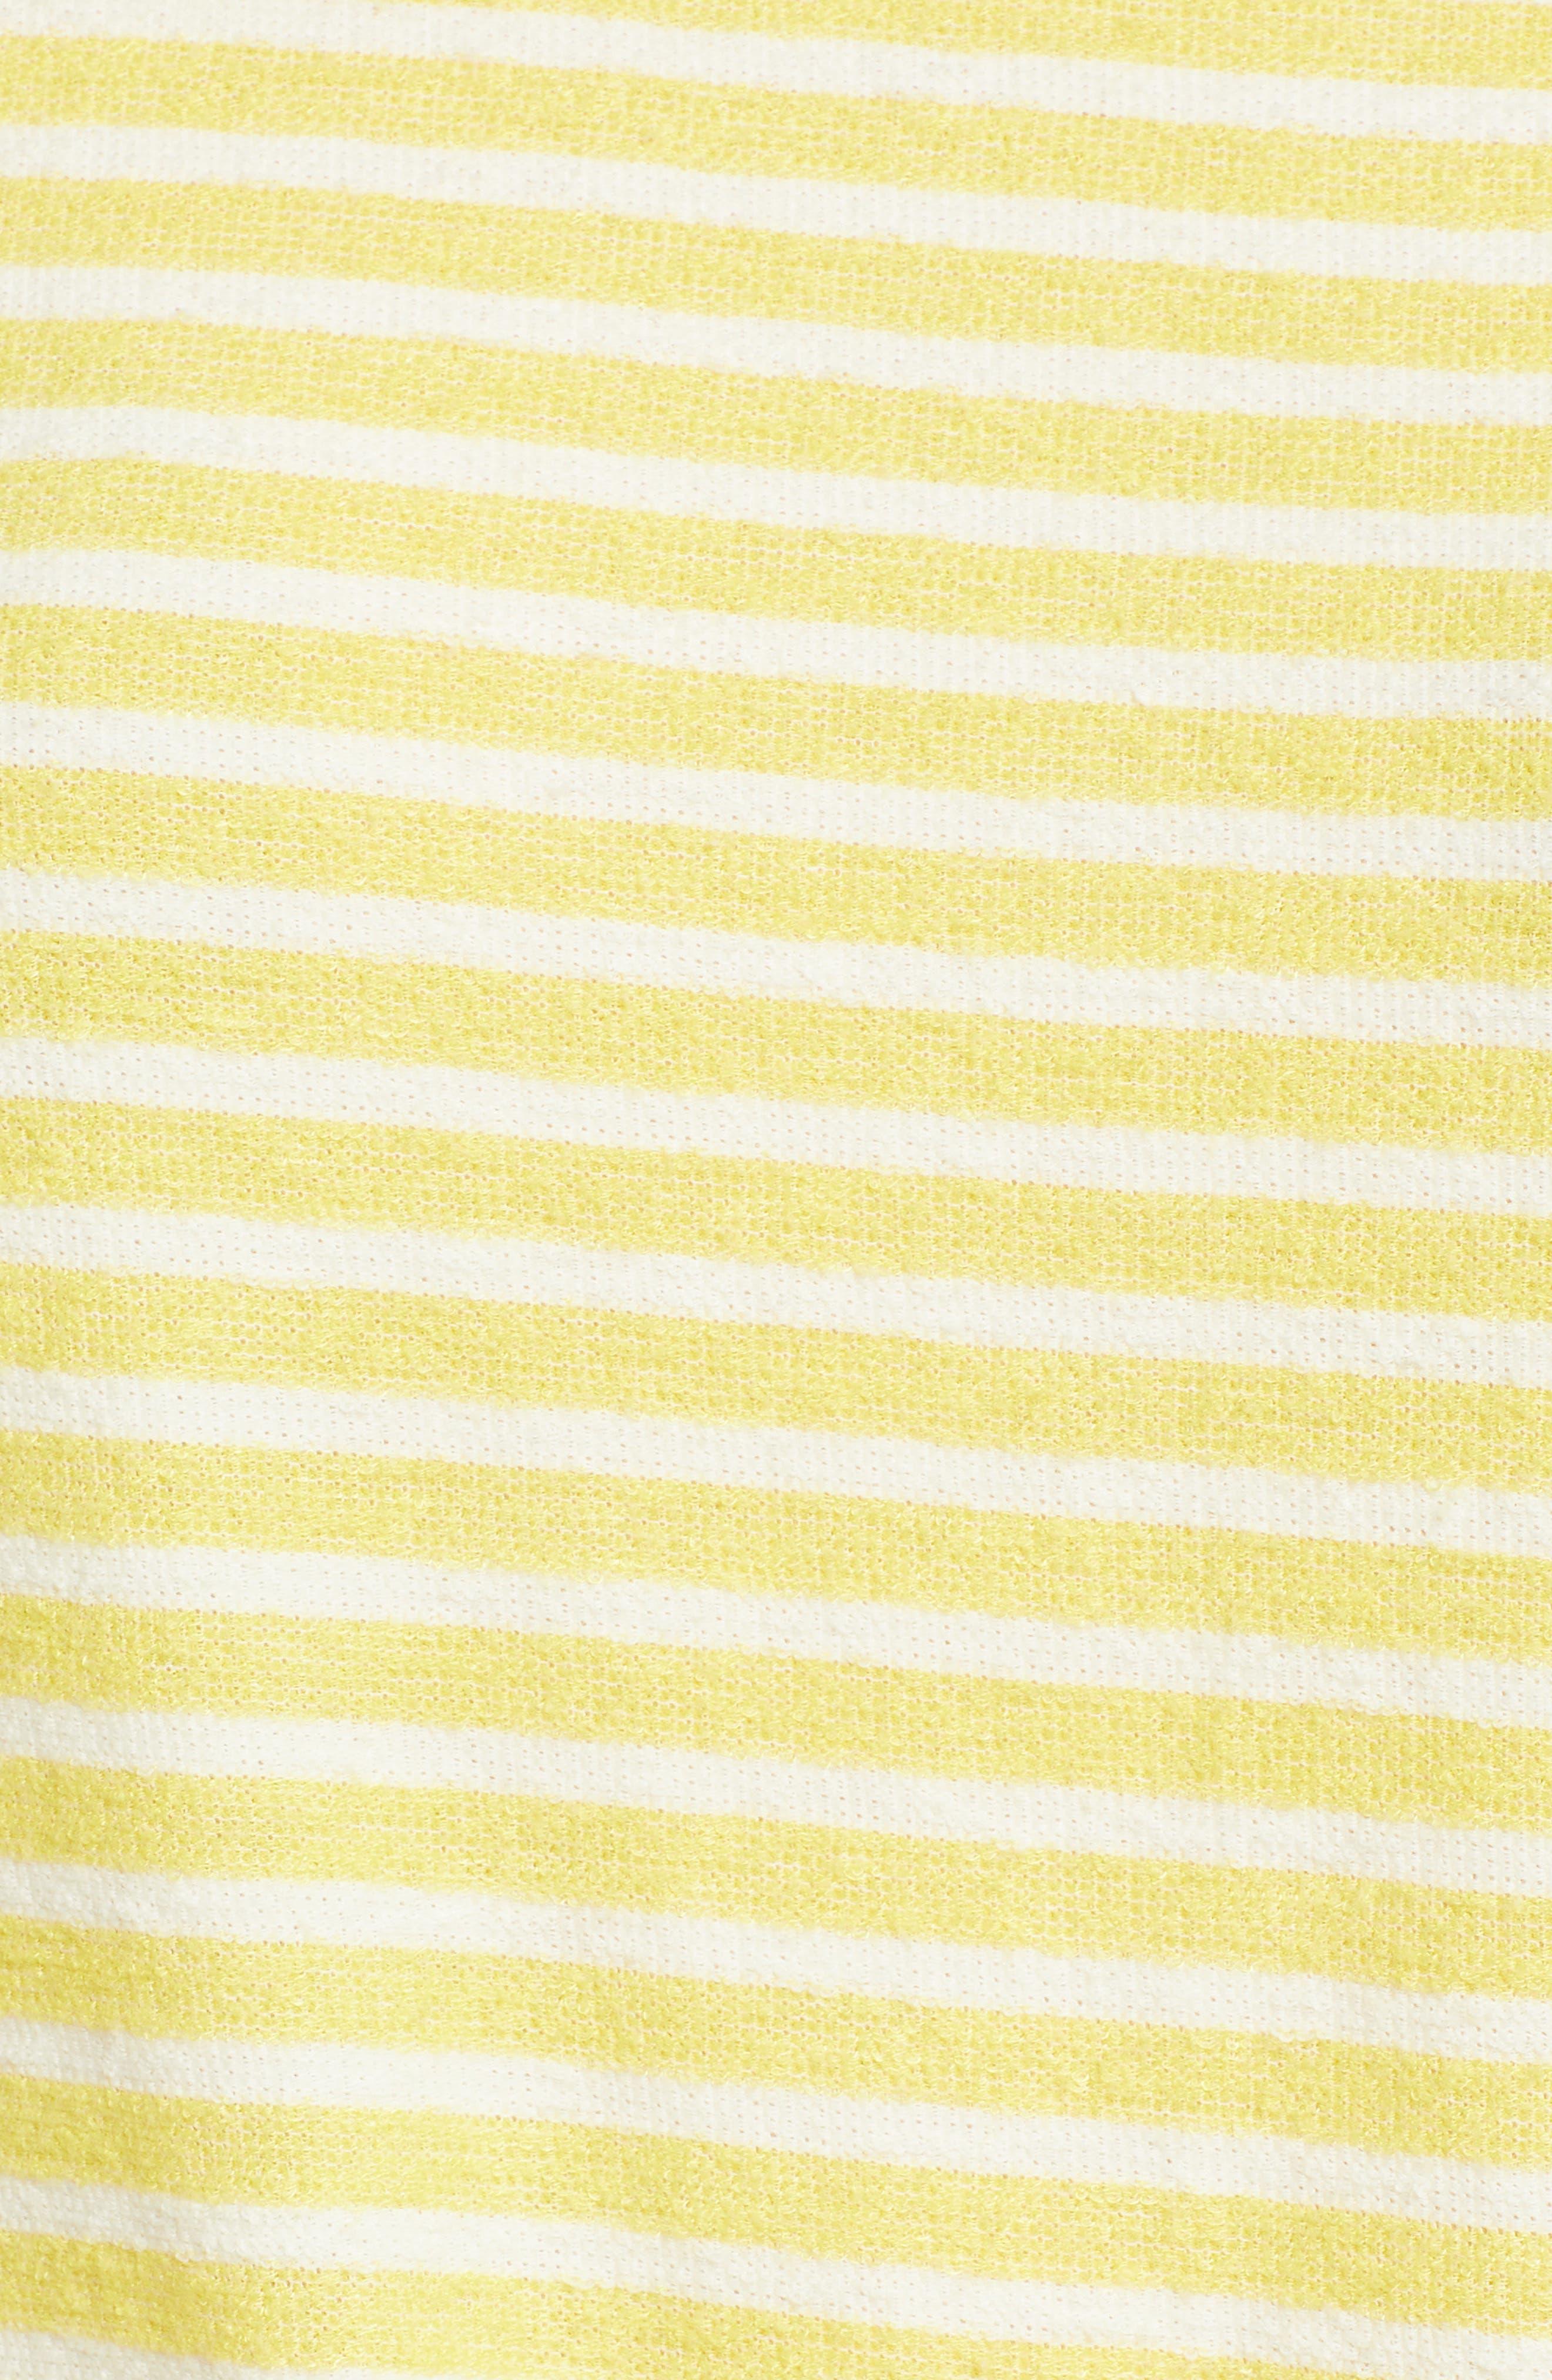 Tie Front Stripe Top,                             Alternate thumbnail 6, color,                             Yellow/ White Stripe